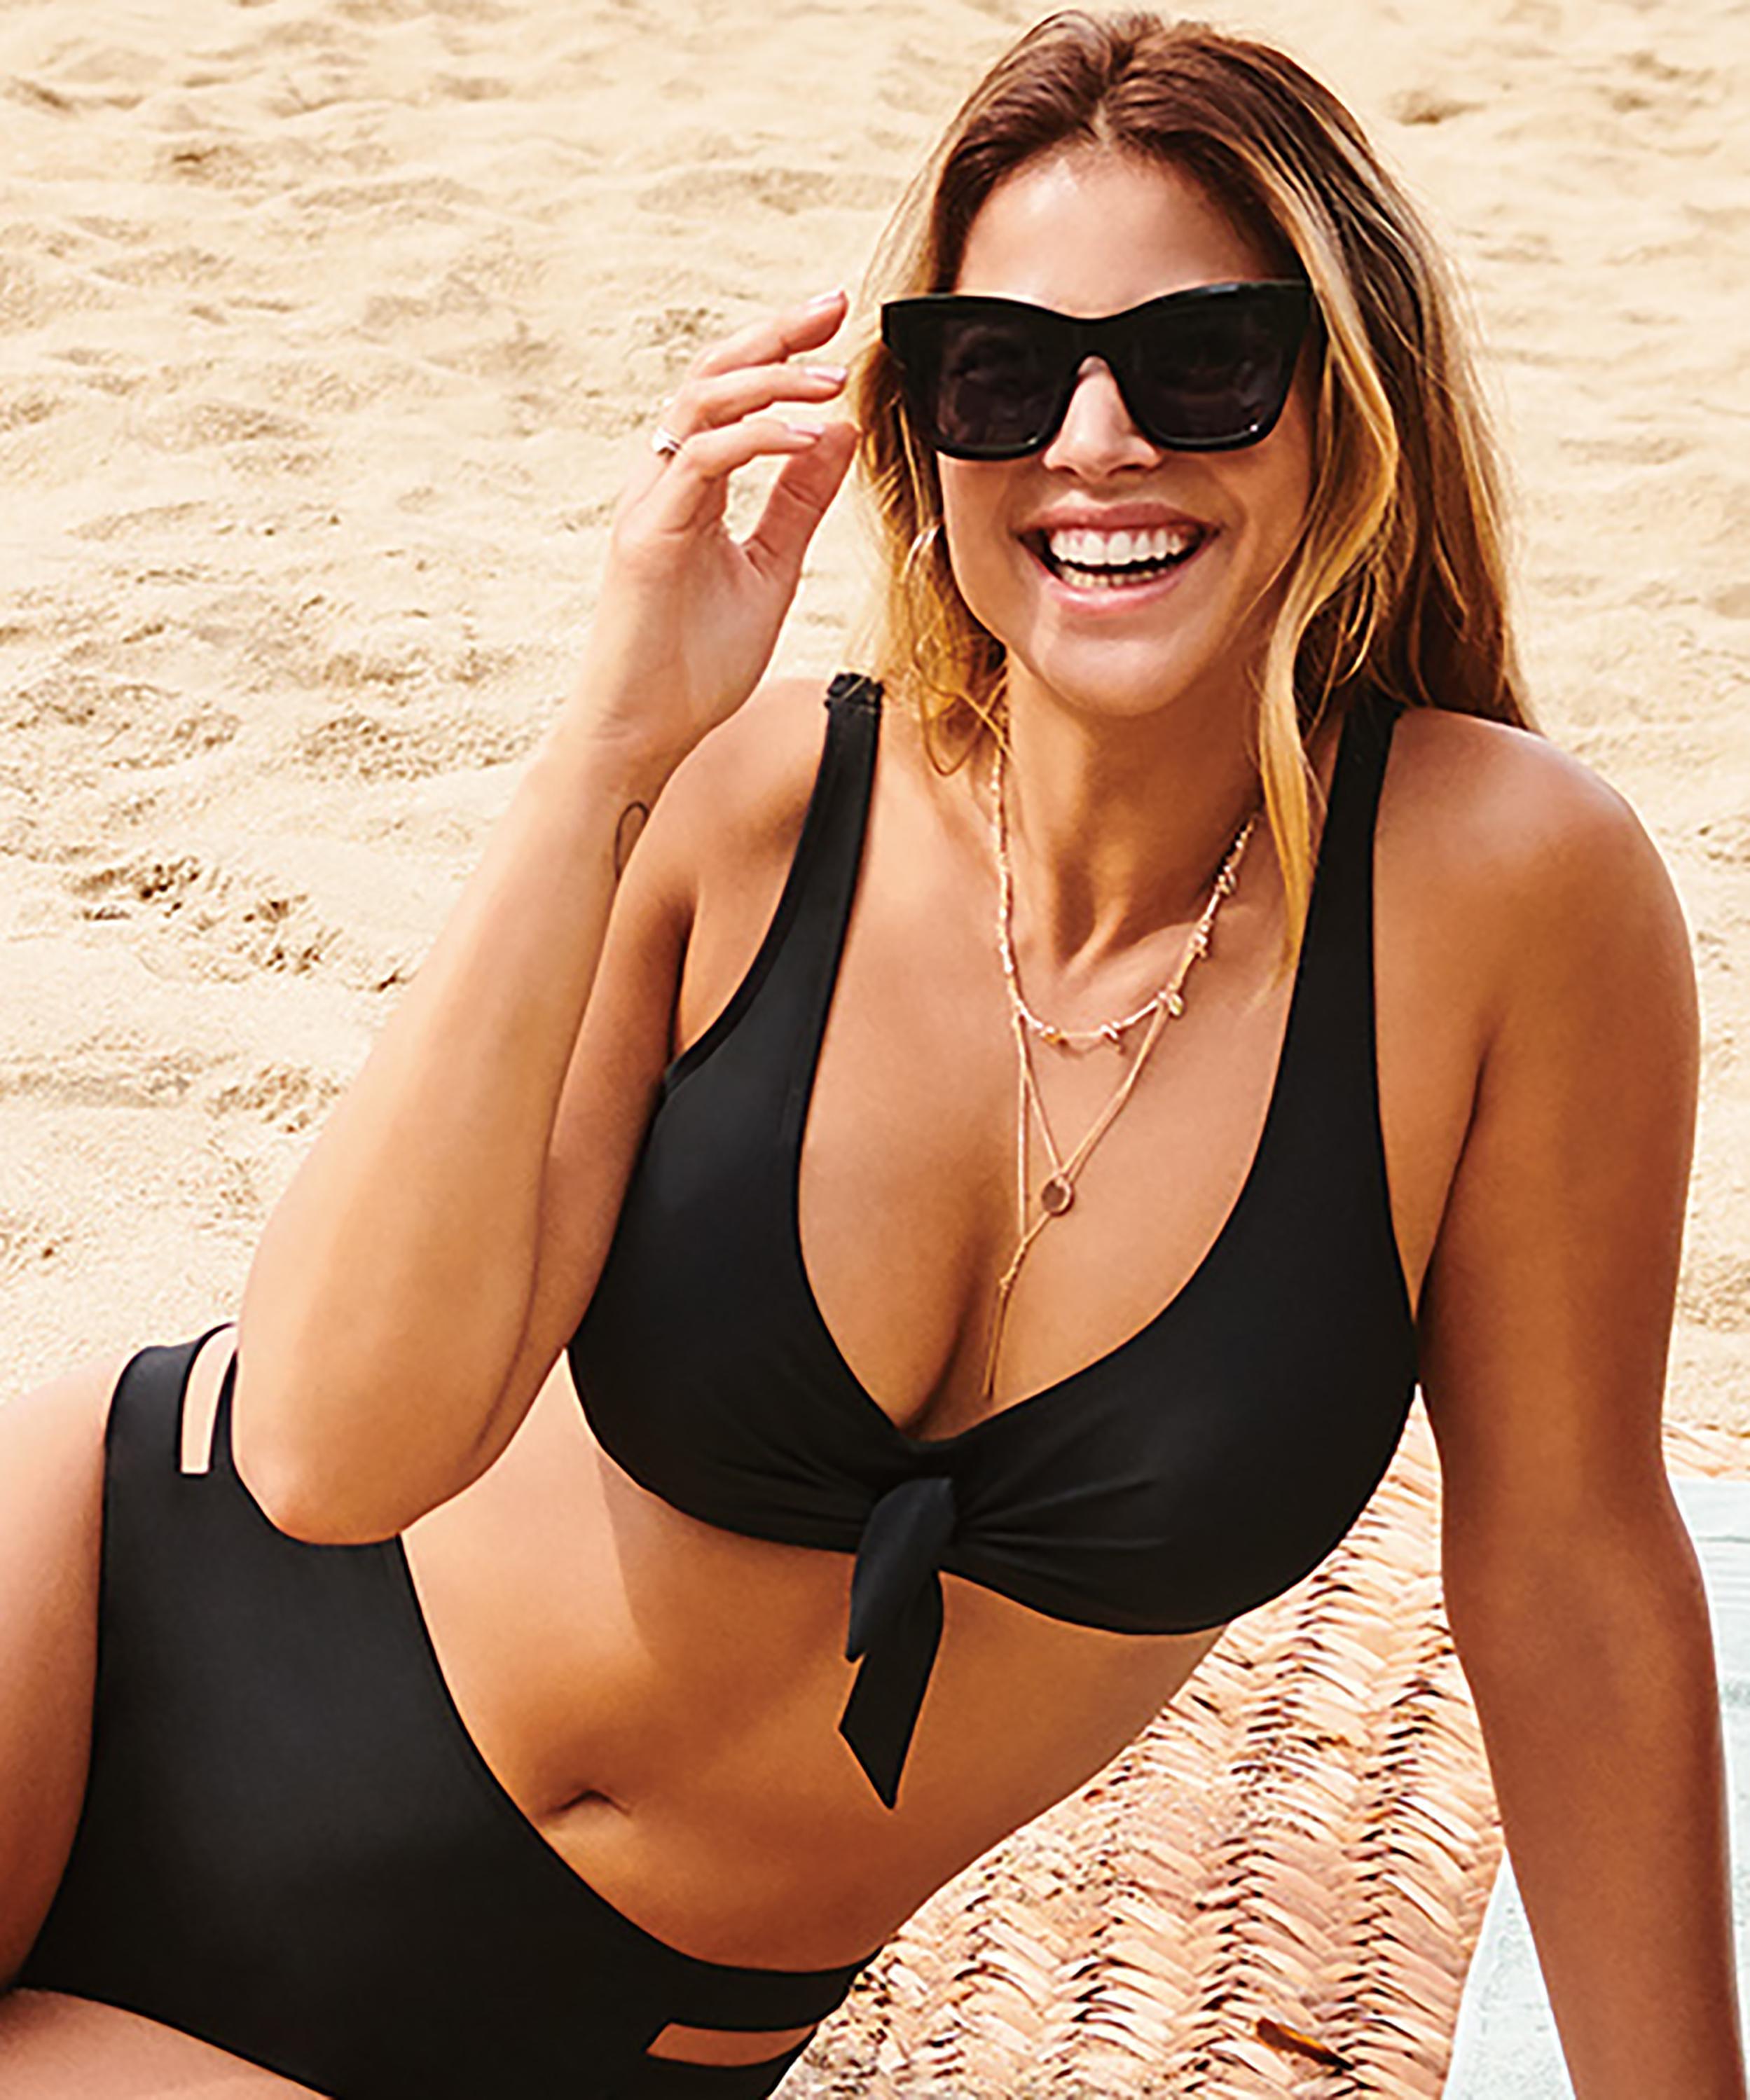 Unformed Clasp Bikini Top Sunset Dreams, Black, main